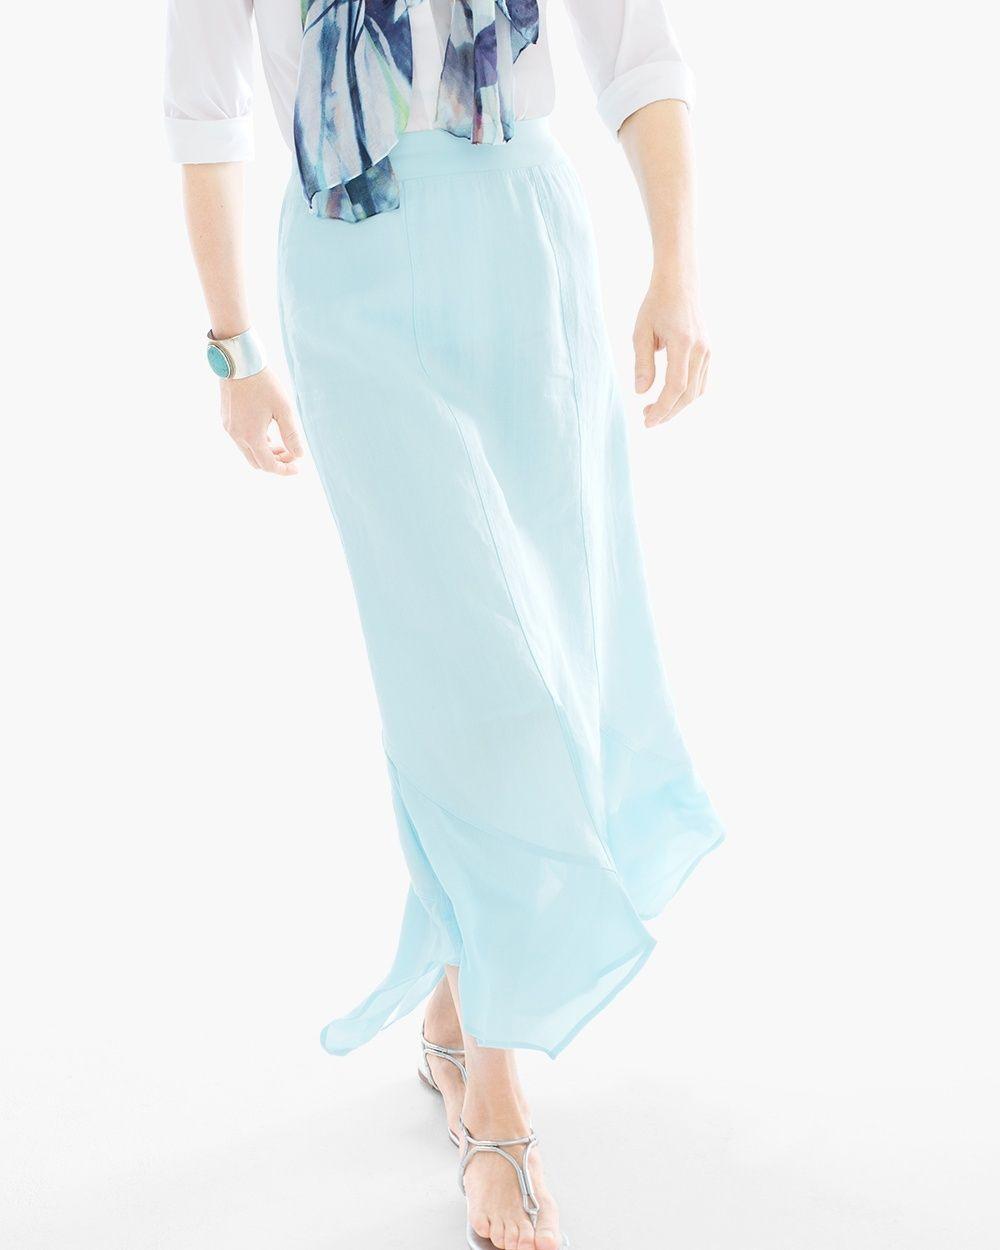 cecab040ec Pull-on styling with elastic waist. Chico's Handkerchief Hem Maxi Skirt in  Aria Aqua #chicos